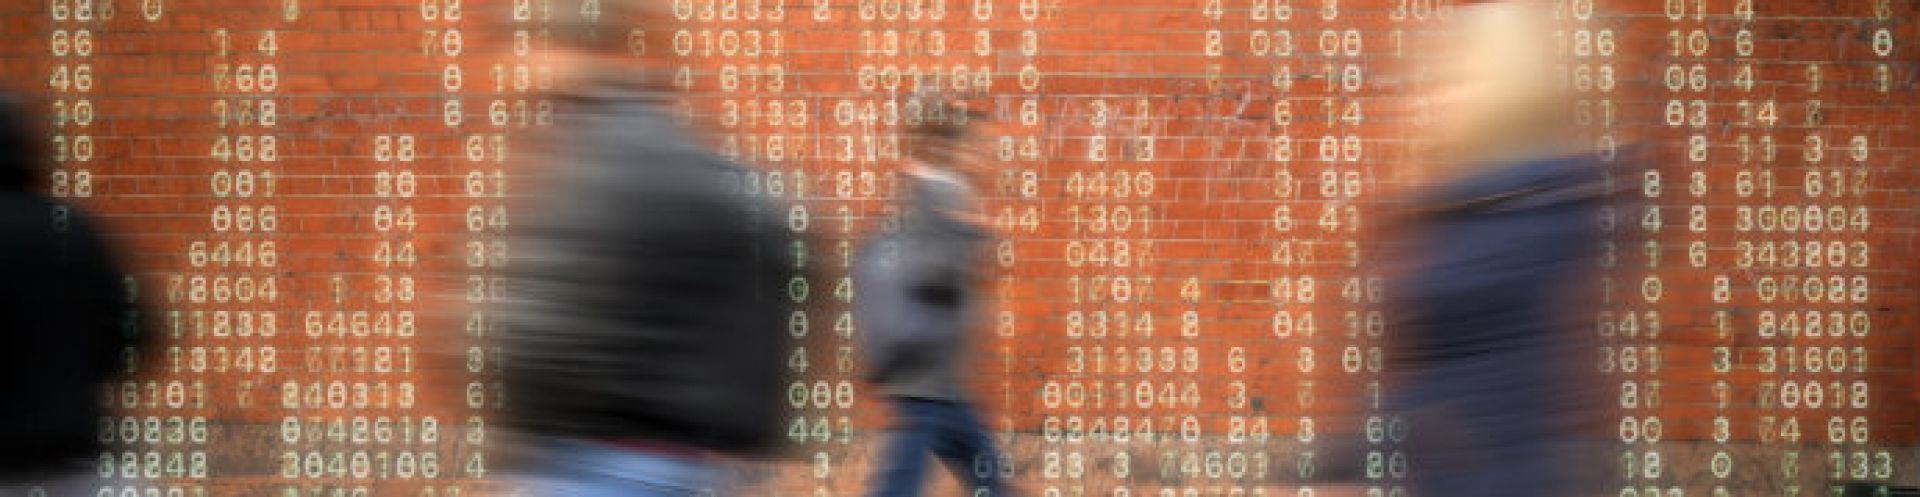 Data privacy research